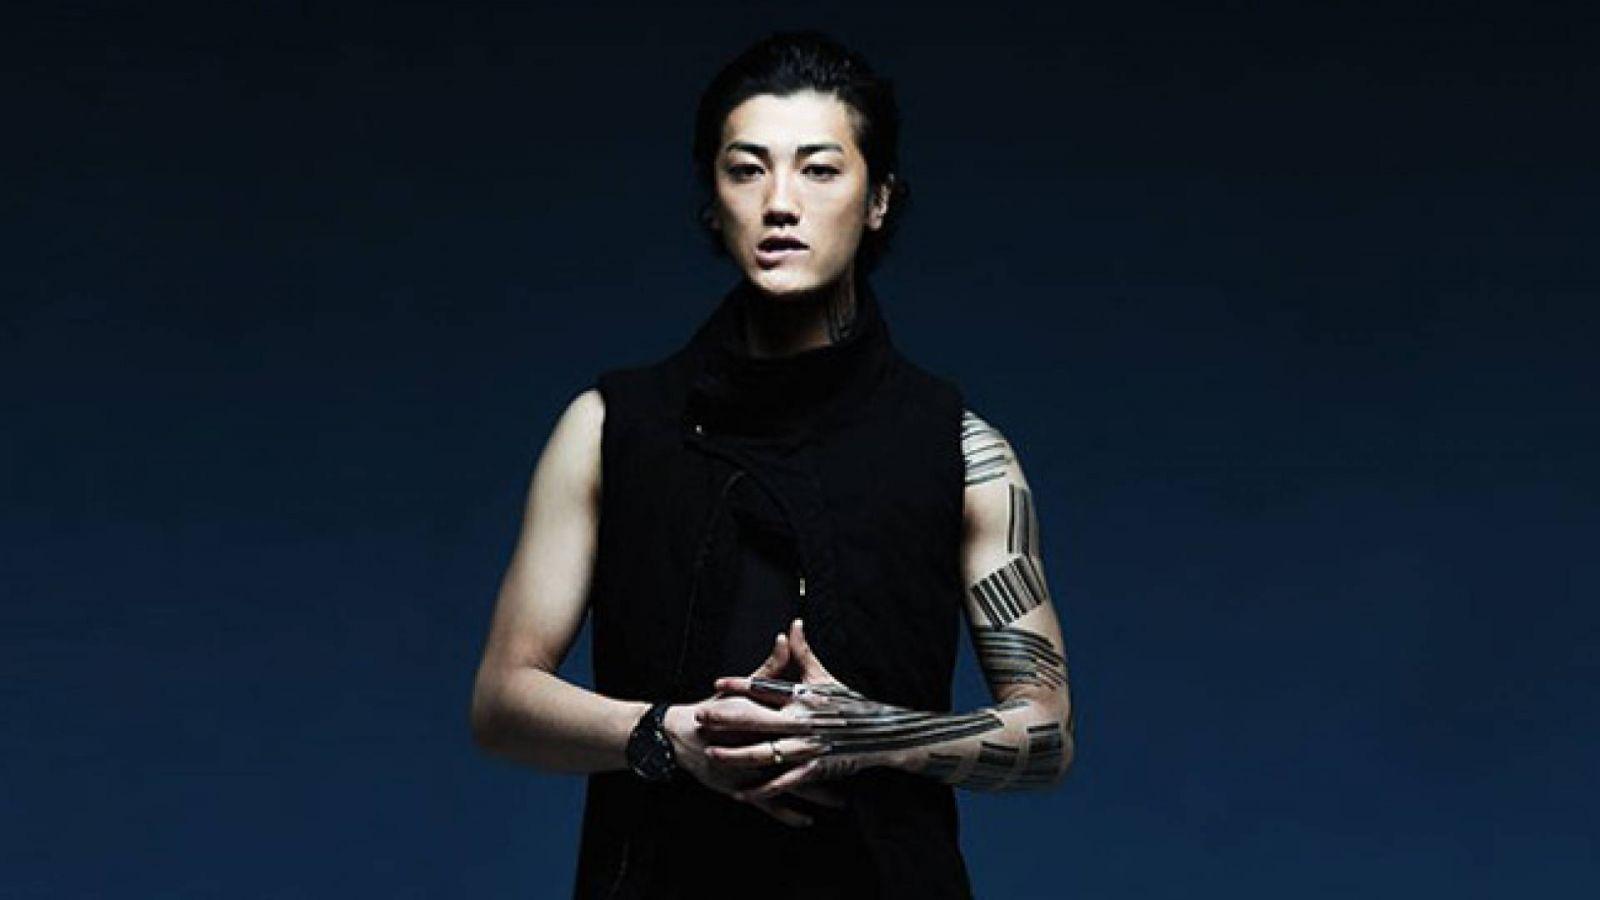 Novo EP de Jin Akanishi © Jin Akanishi All Rights Reserved.